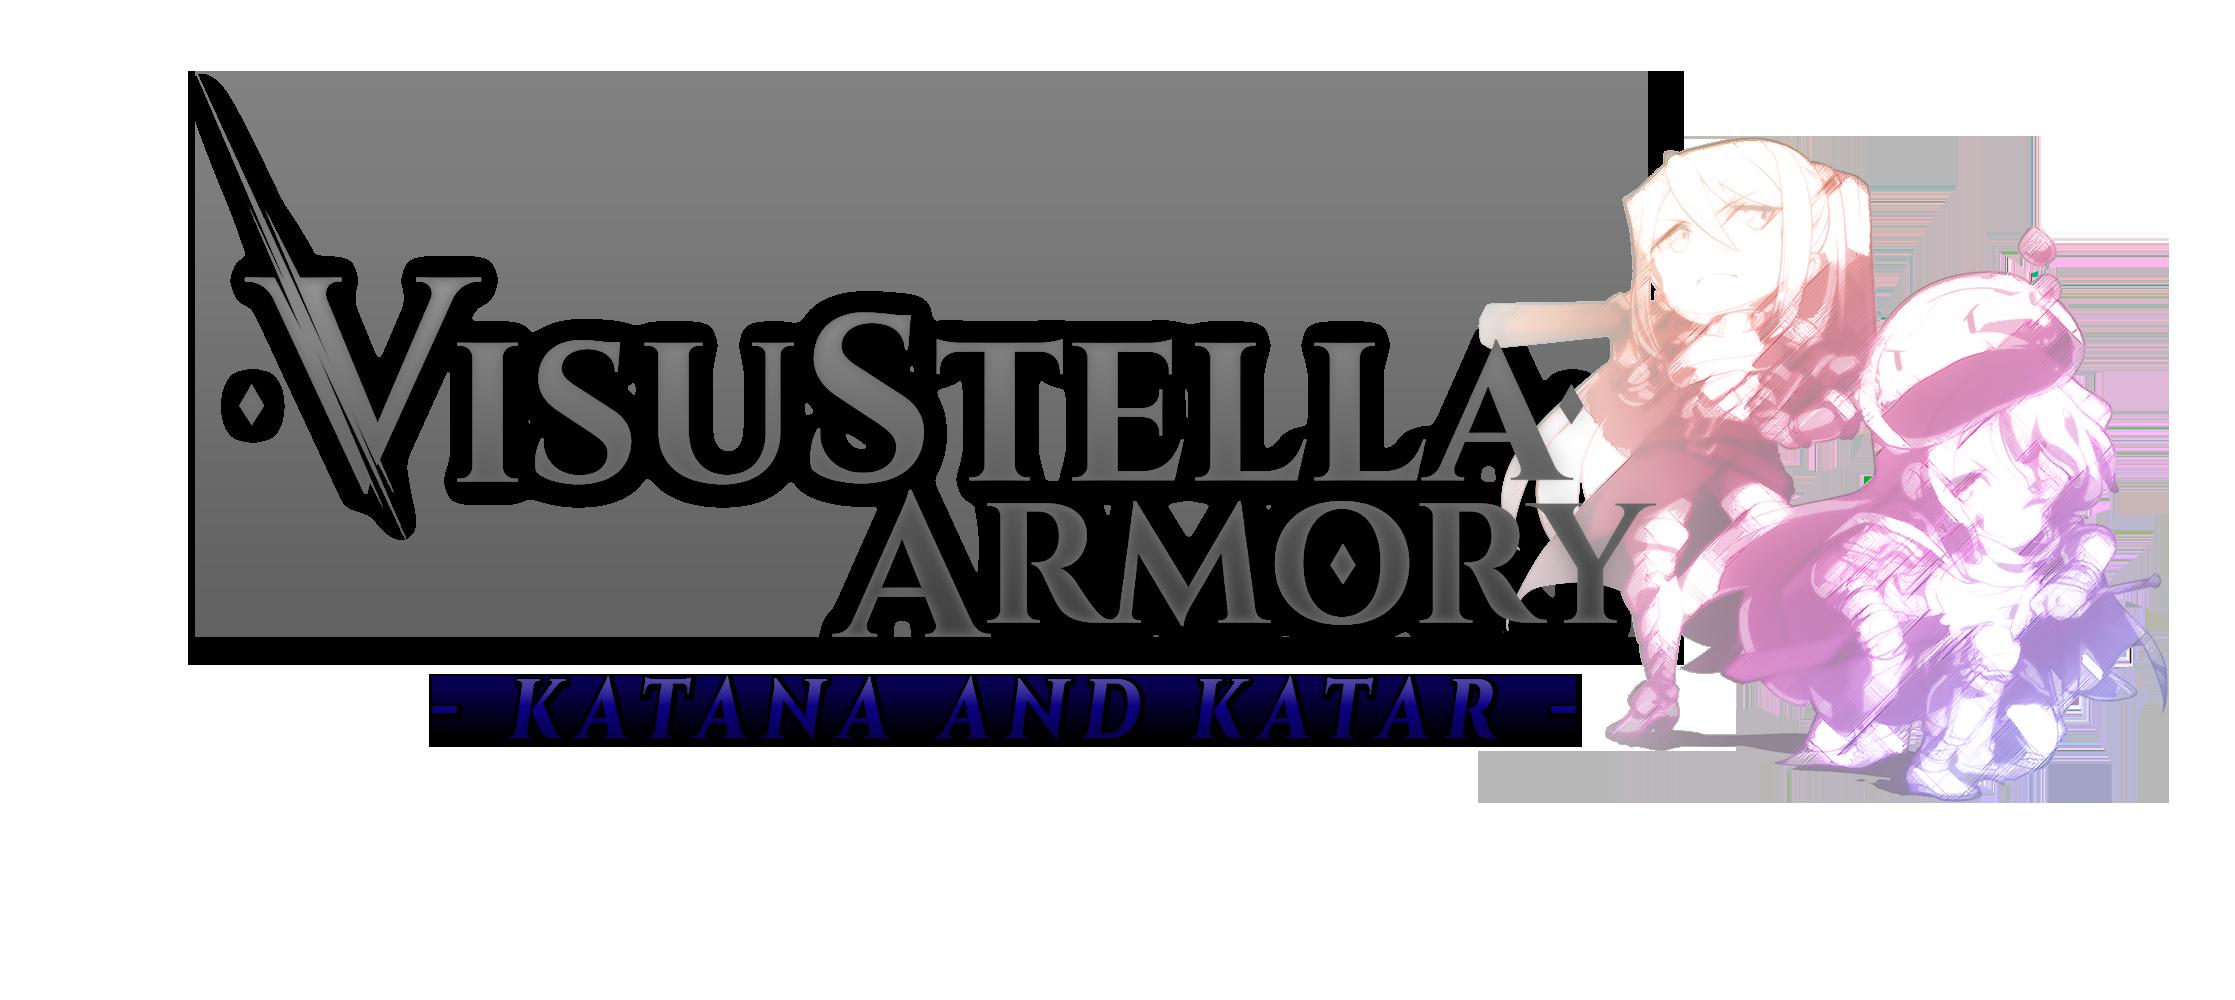 VisuStella Armory: Katana and Katar